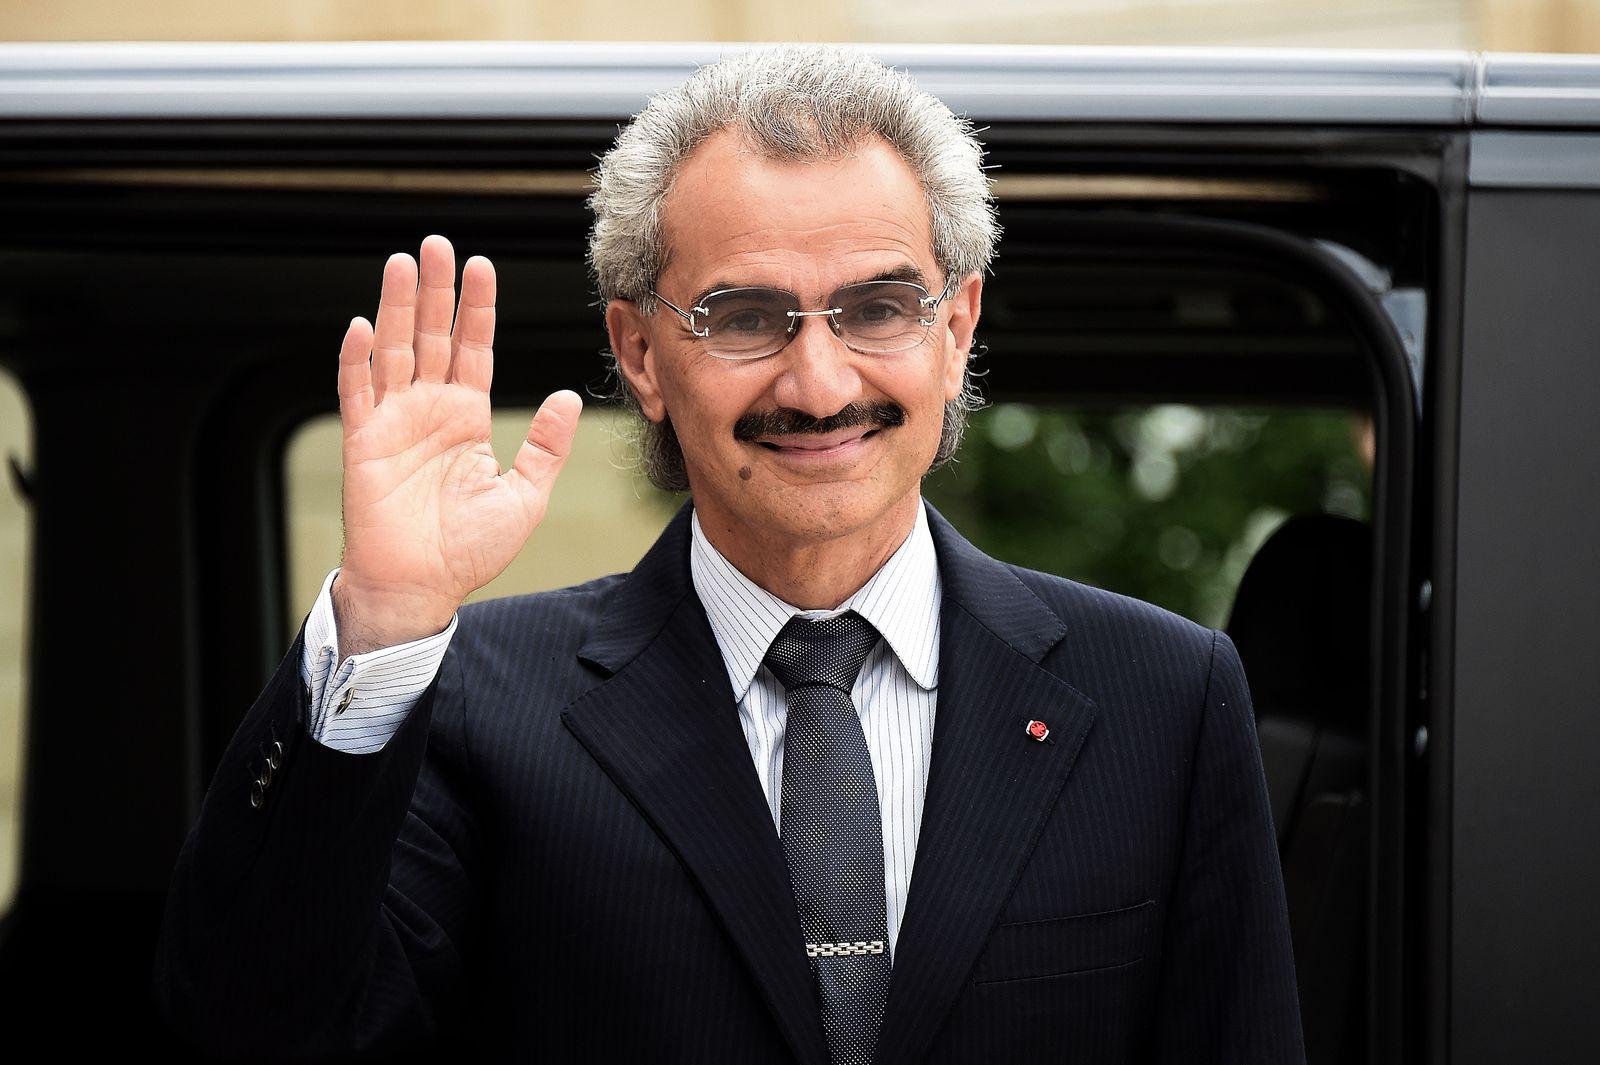 Saudi-Arabien/ Festnahmen/ Al Waleed bin Talal bin Abdulaziz Al Saoud